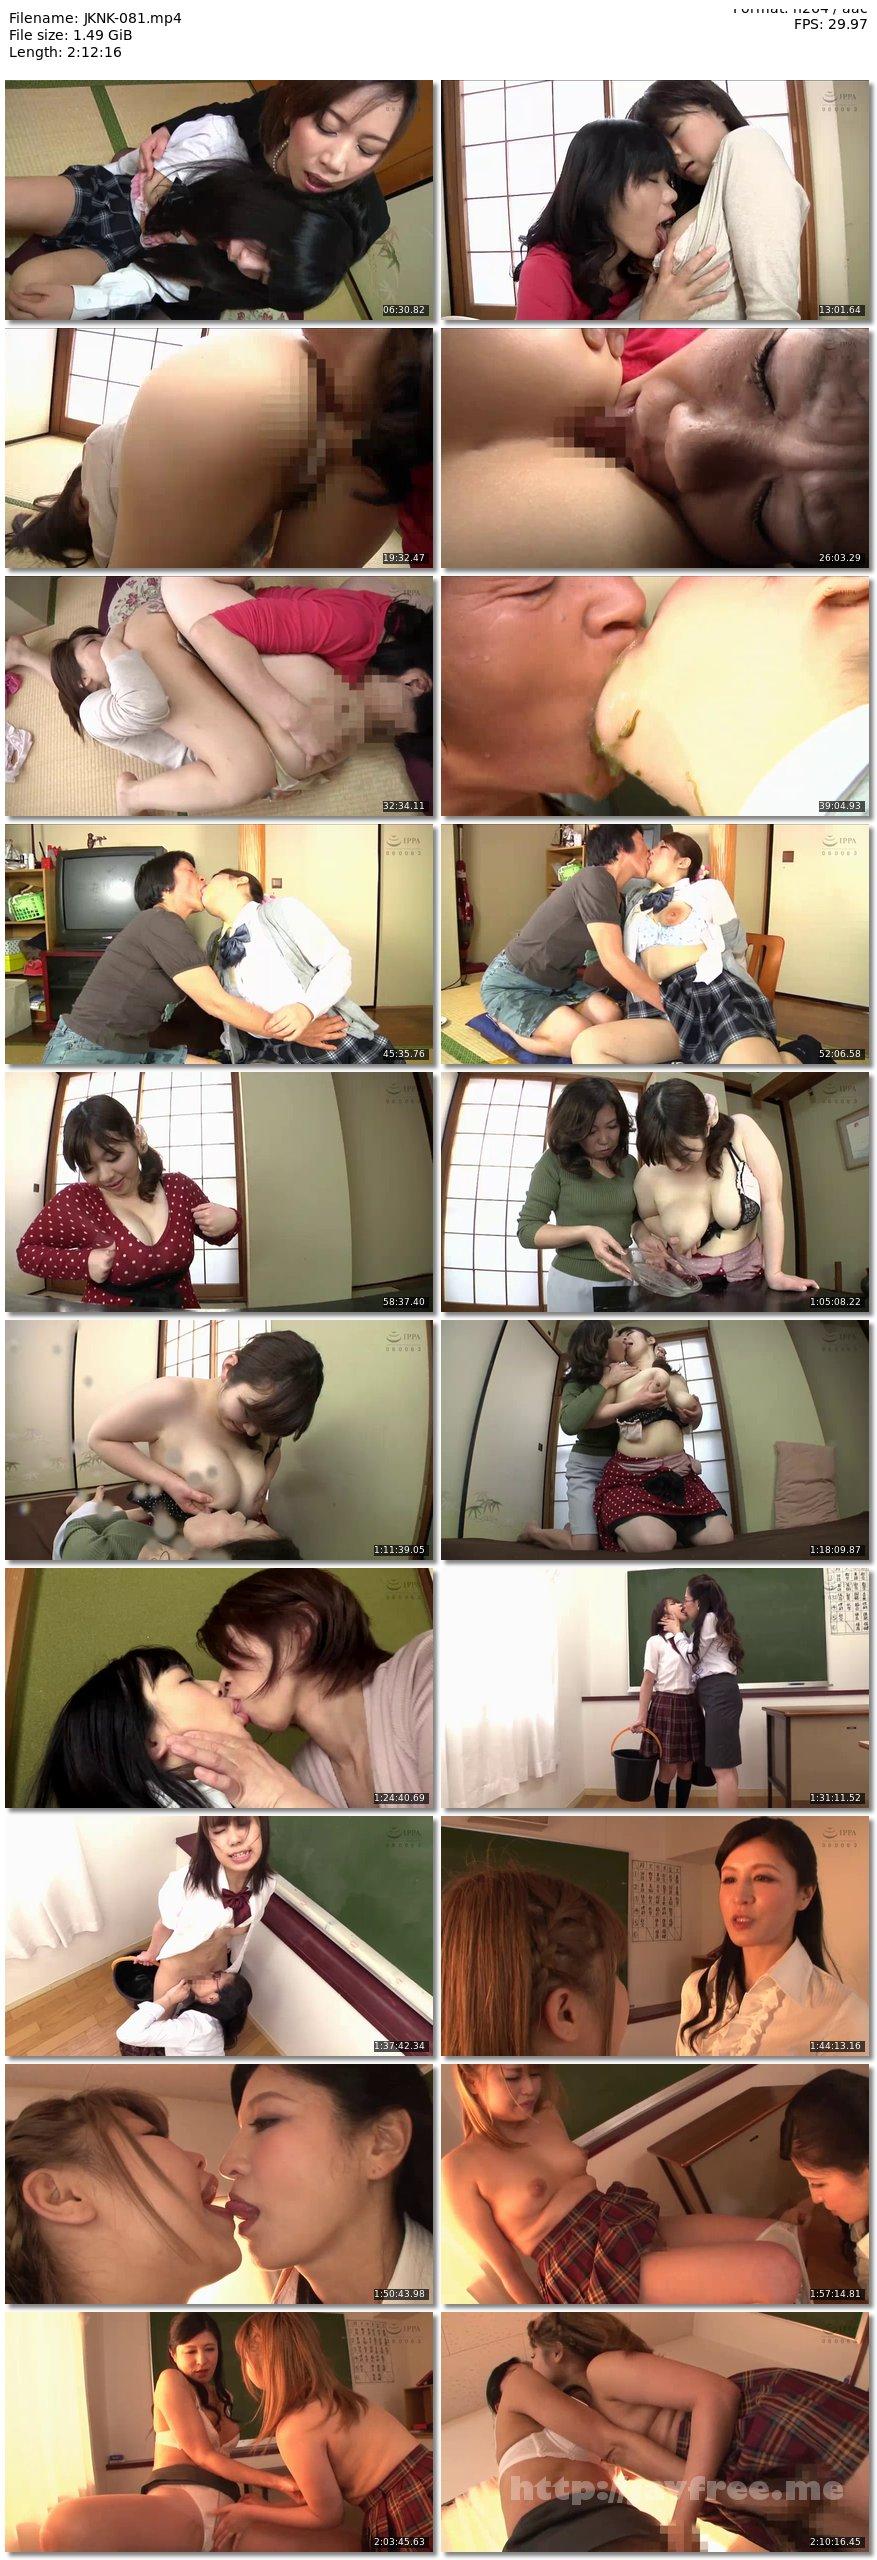 [JKNK-081] 年の差レズ 6 - image JKNK-081 on https://javfree.me